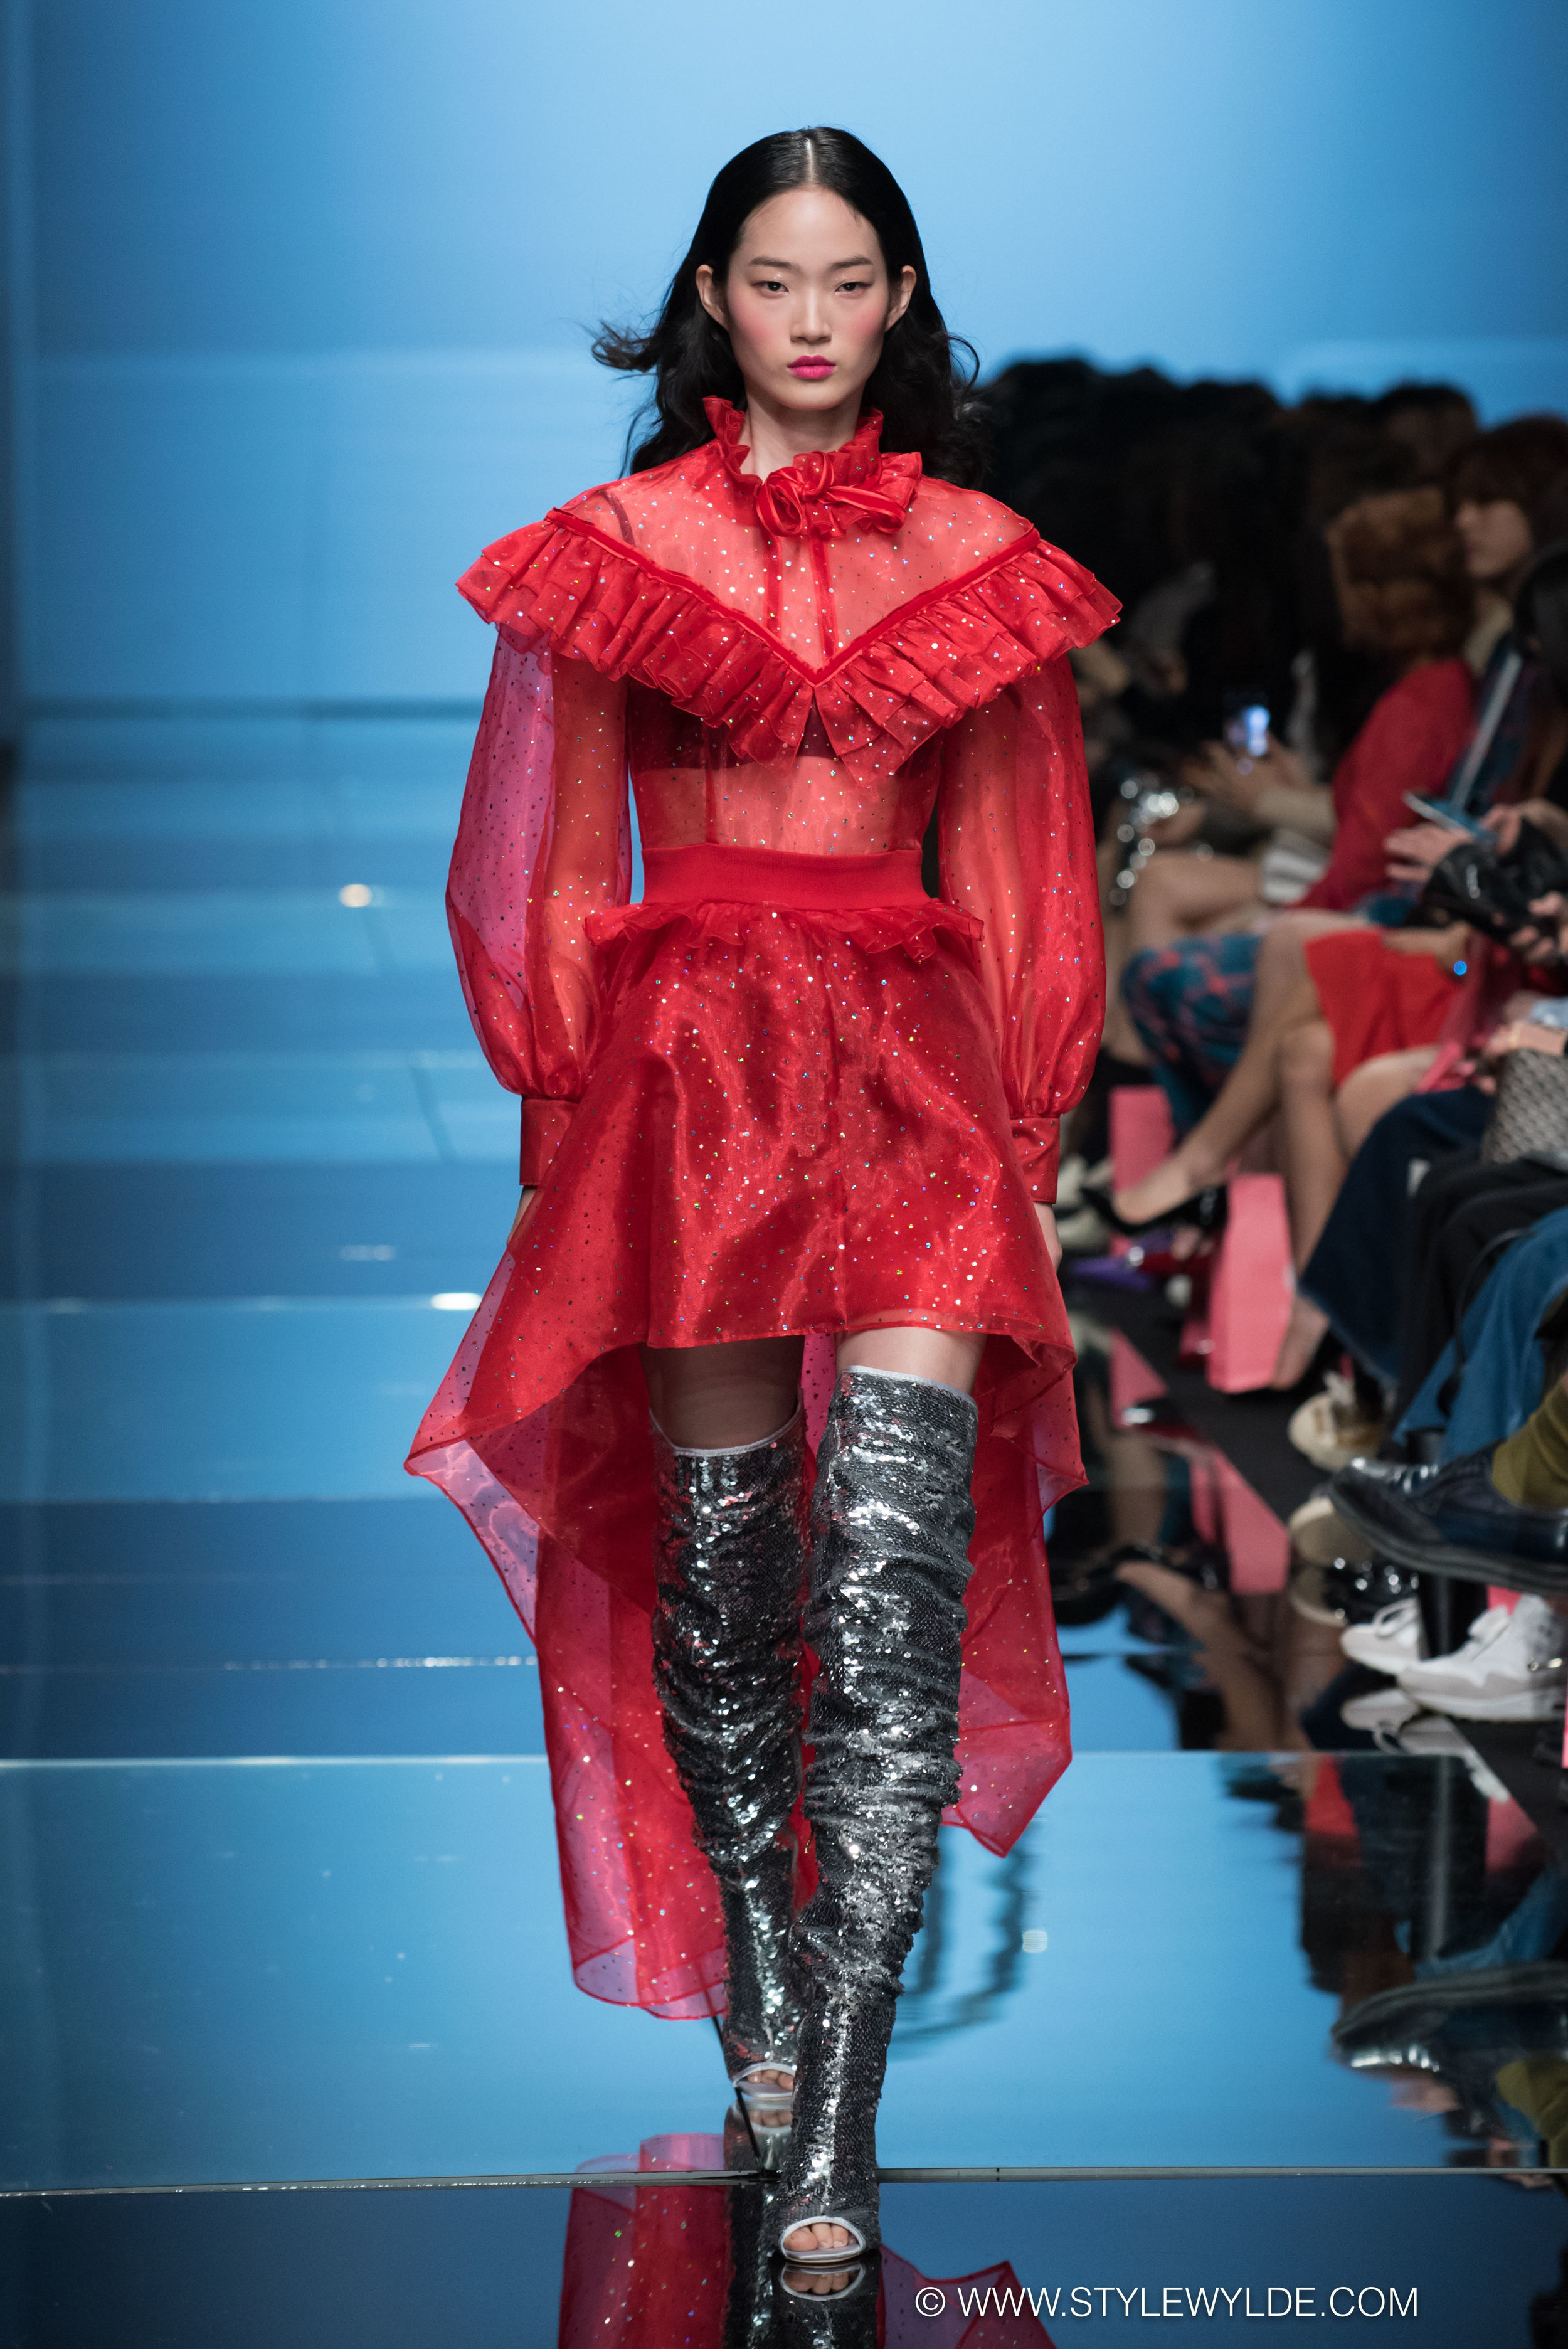 CynthiaHopeAnderson-HeraSeoul FashionWeekAW18-Lang&Lu-51.jpg